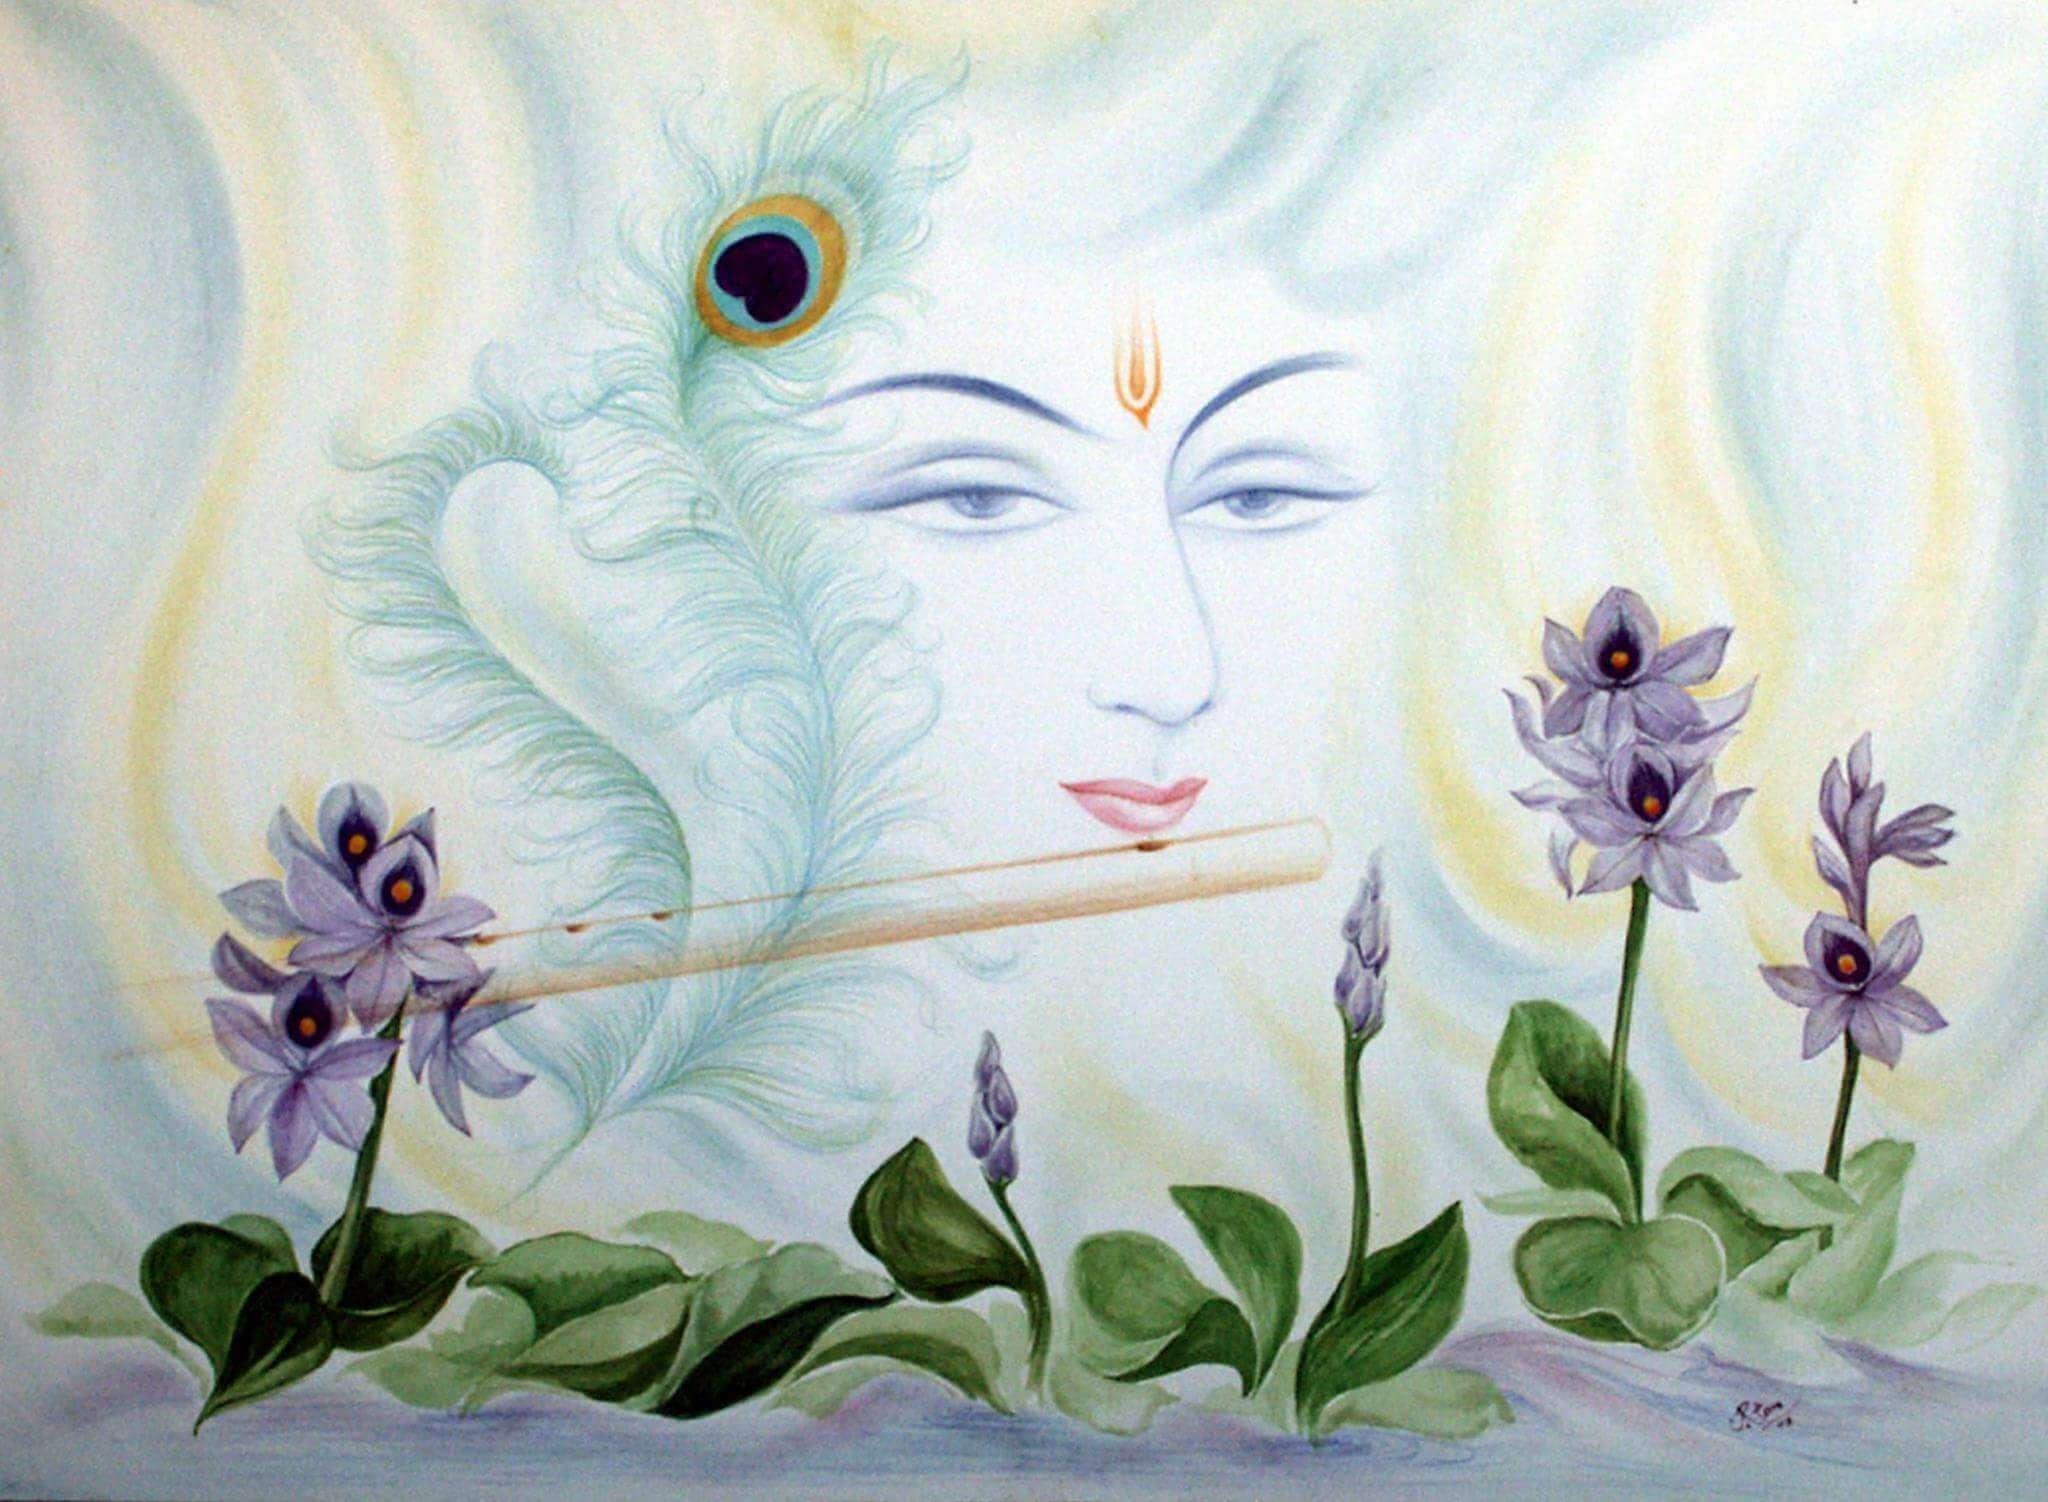 श्रीकृष्ण का चित्र ऋतम उपाध्याय द्वारा